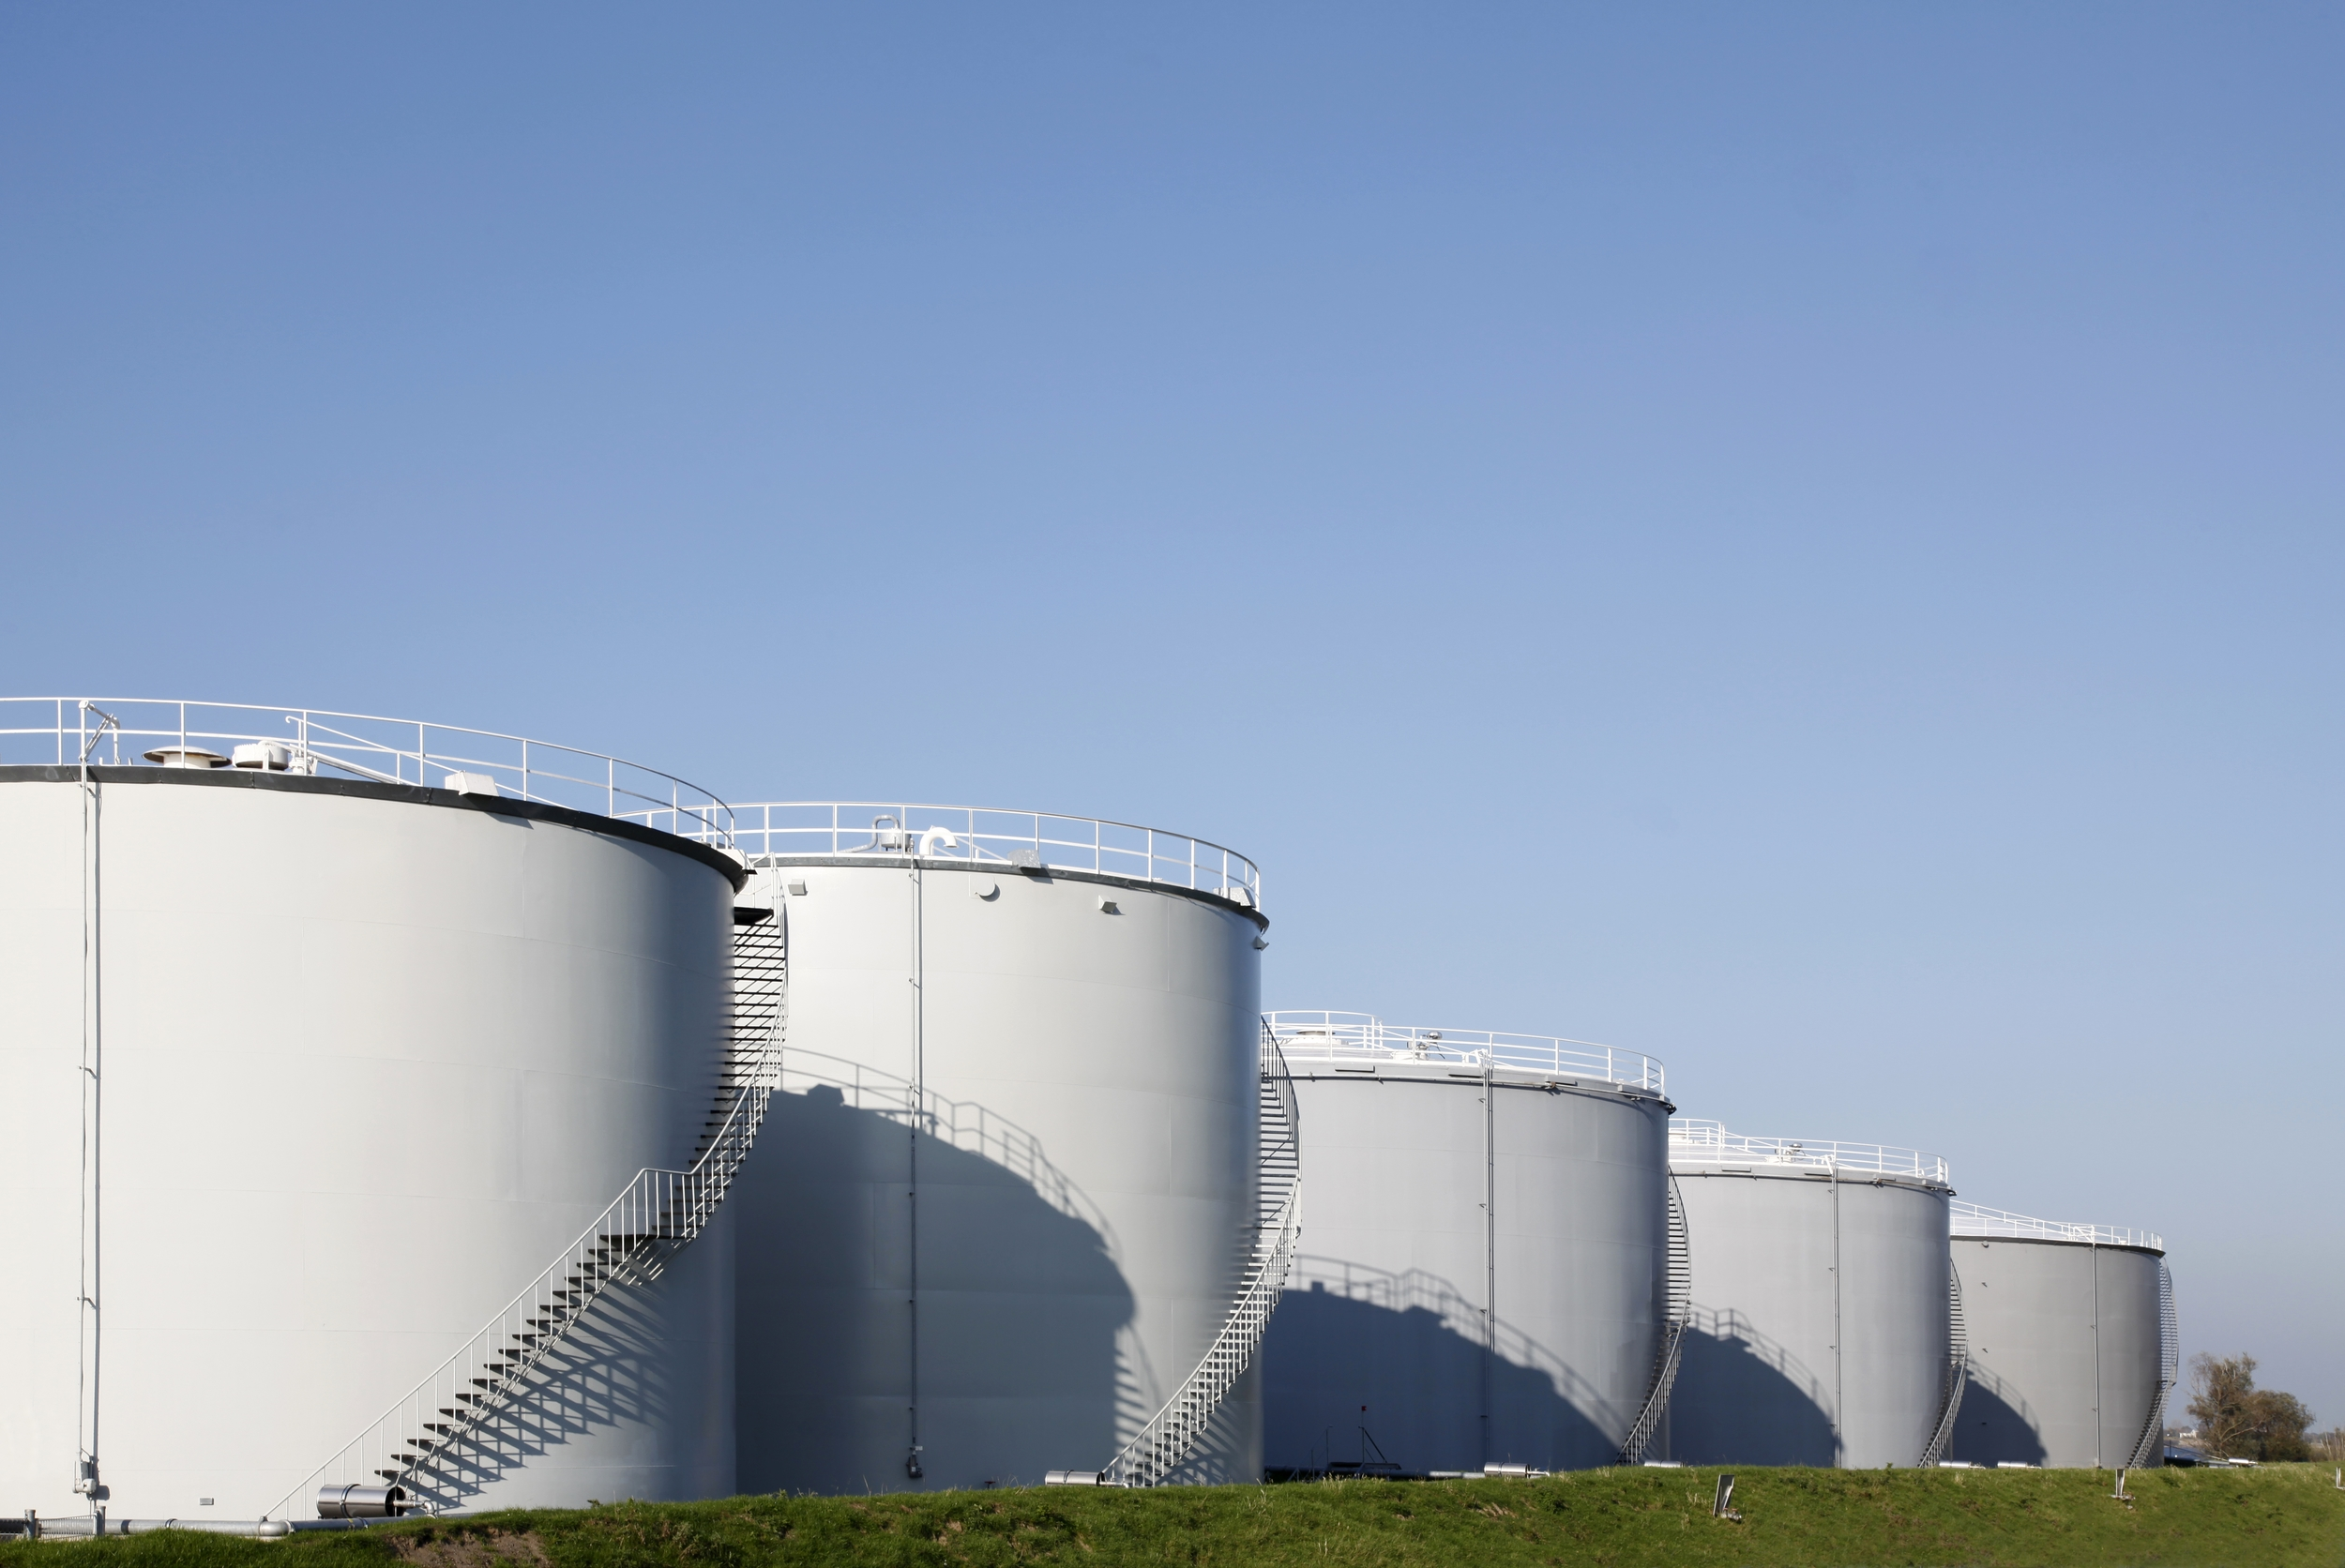 ILFC Ten 02 Fuel Inhibitor Military Storage Stabilizer, Lubricant